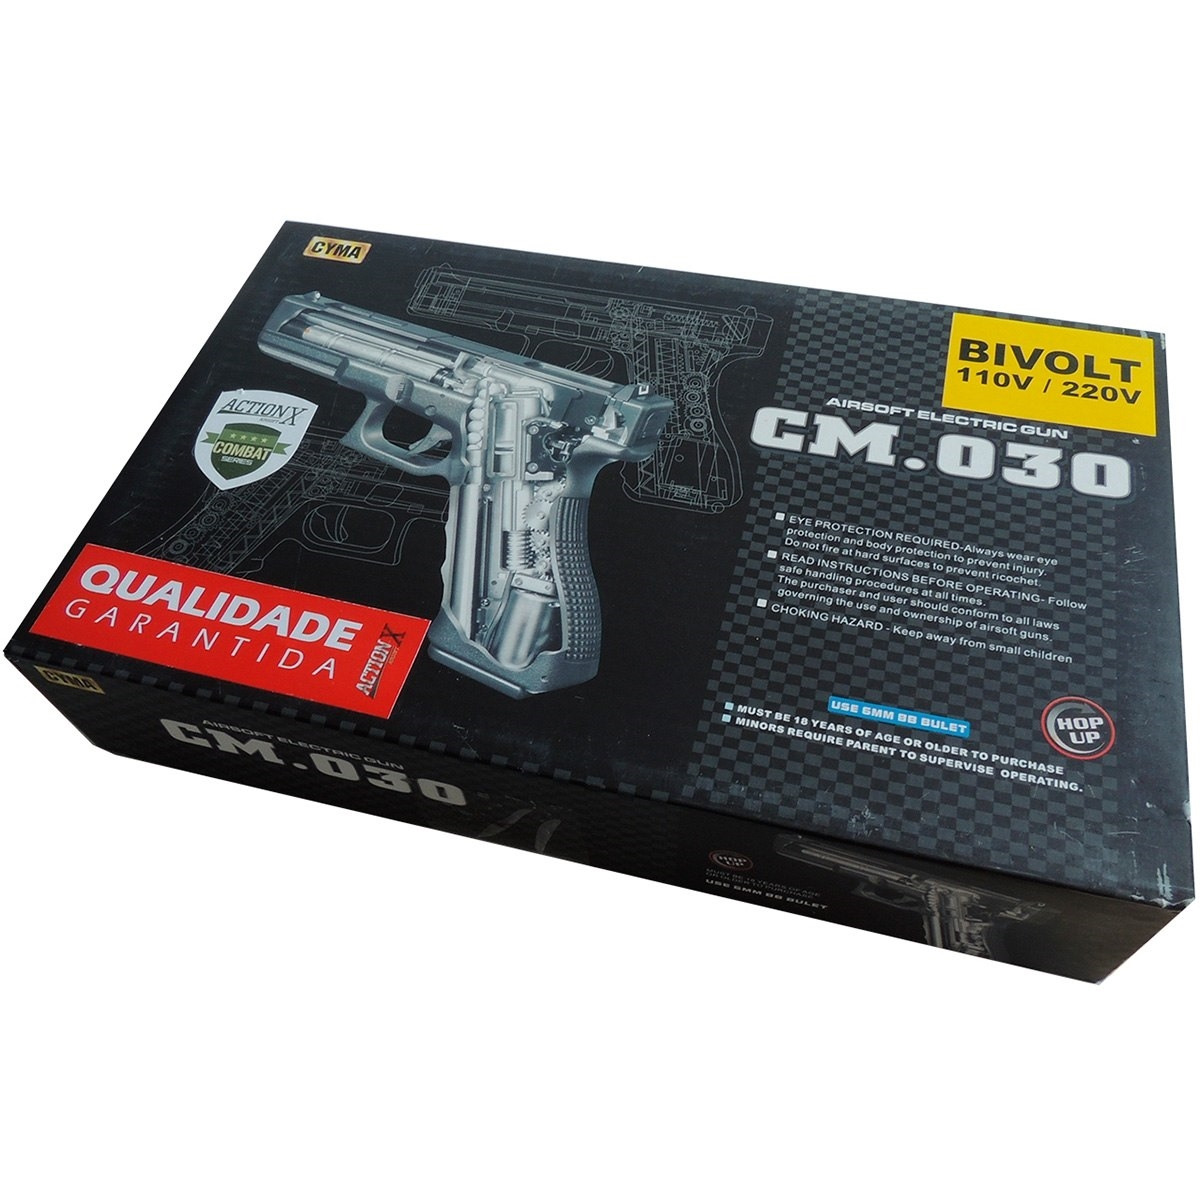 Pistola Airsoft Elétrica Glock 18c Cyma Bivolt Rajada Kit 4